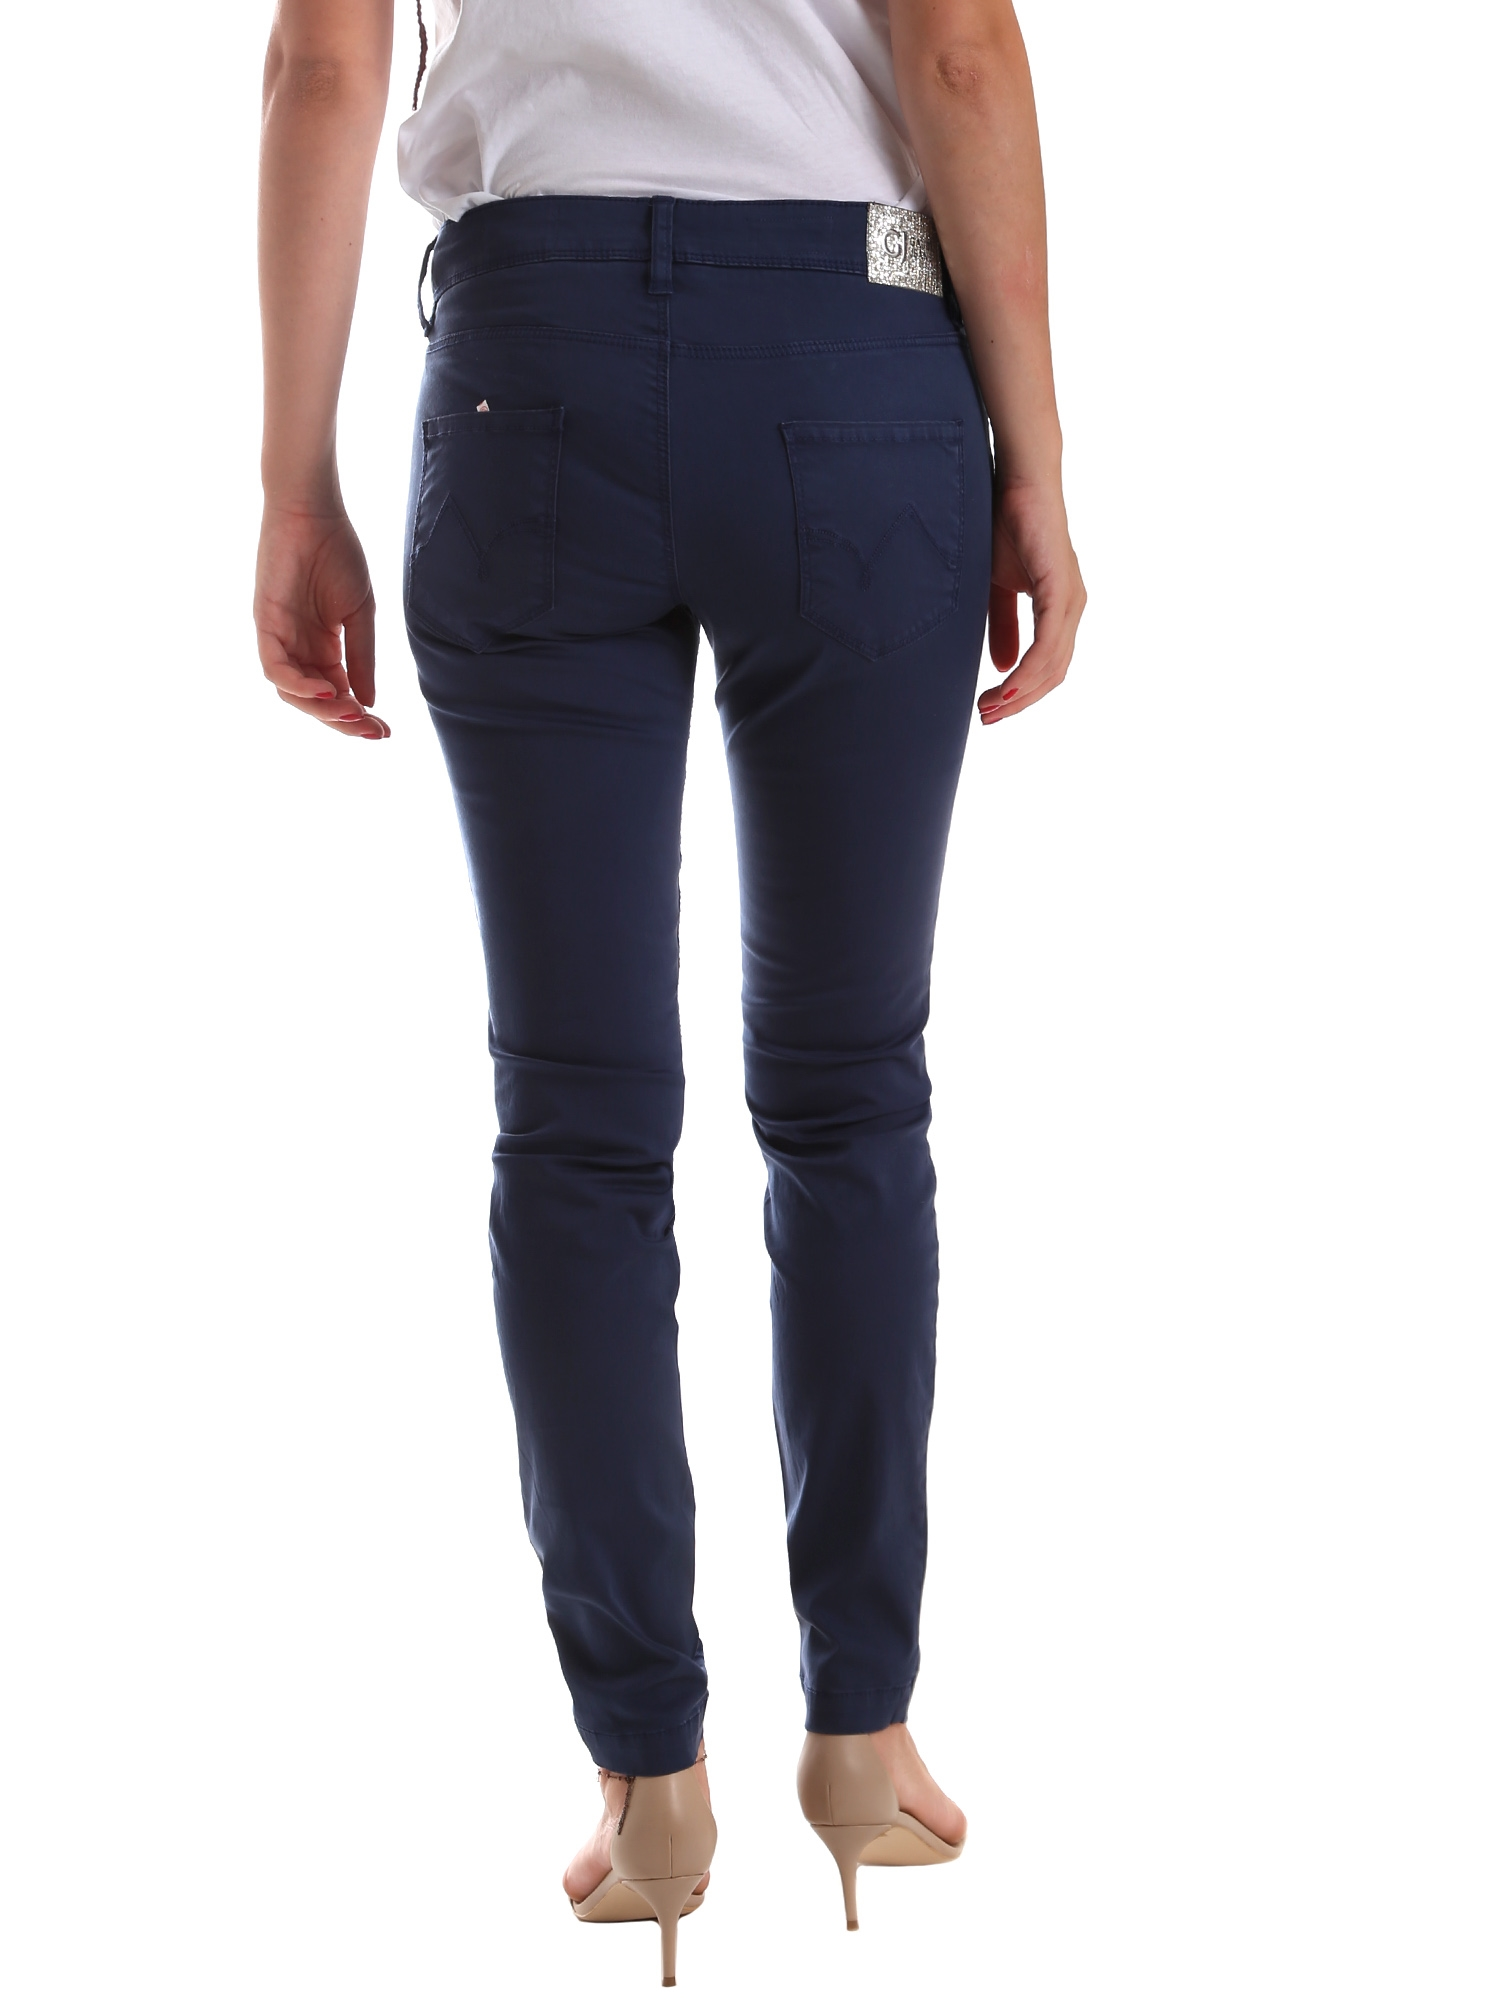 Pantalone 5 tasche in cotone  GAUDI JEANS | Pantaloni | BD250052843